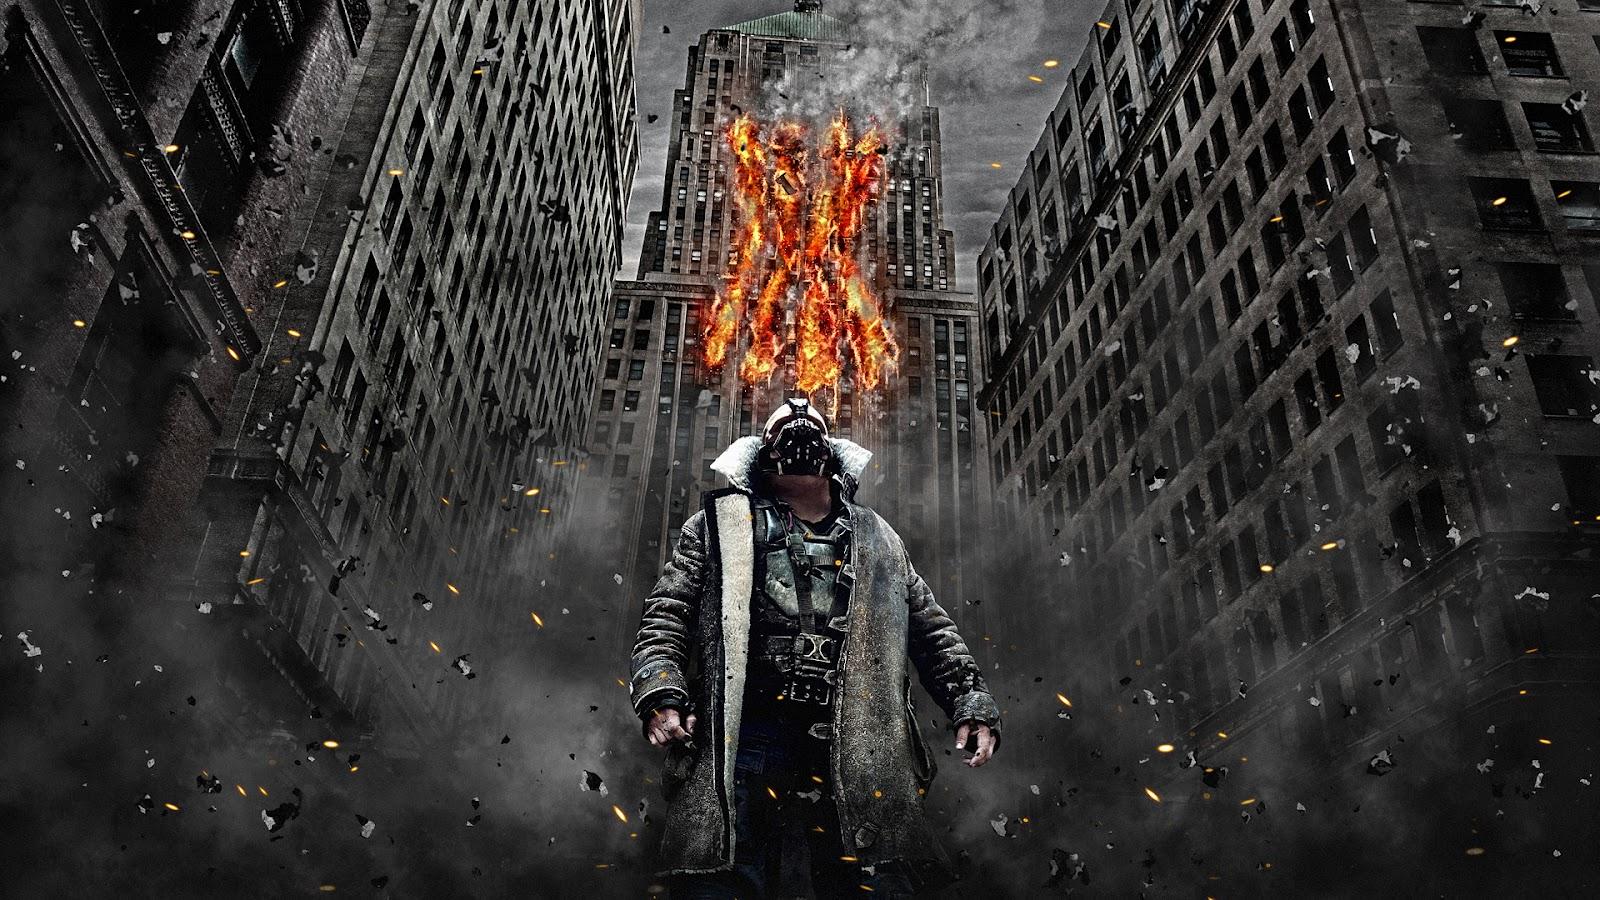 Batman the dark knight rises bane debris buildings for Dark knight rises wall mural